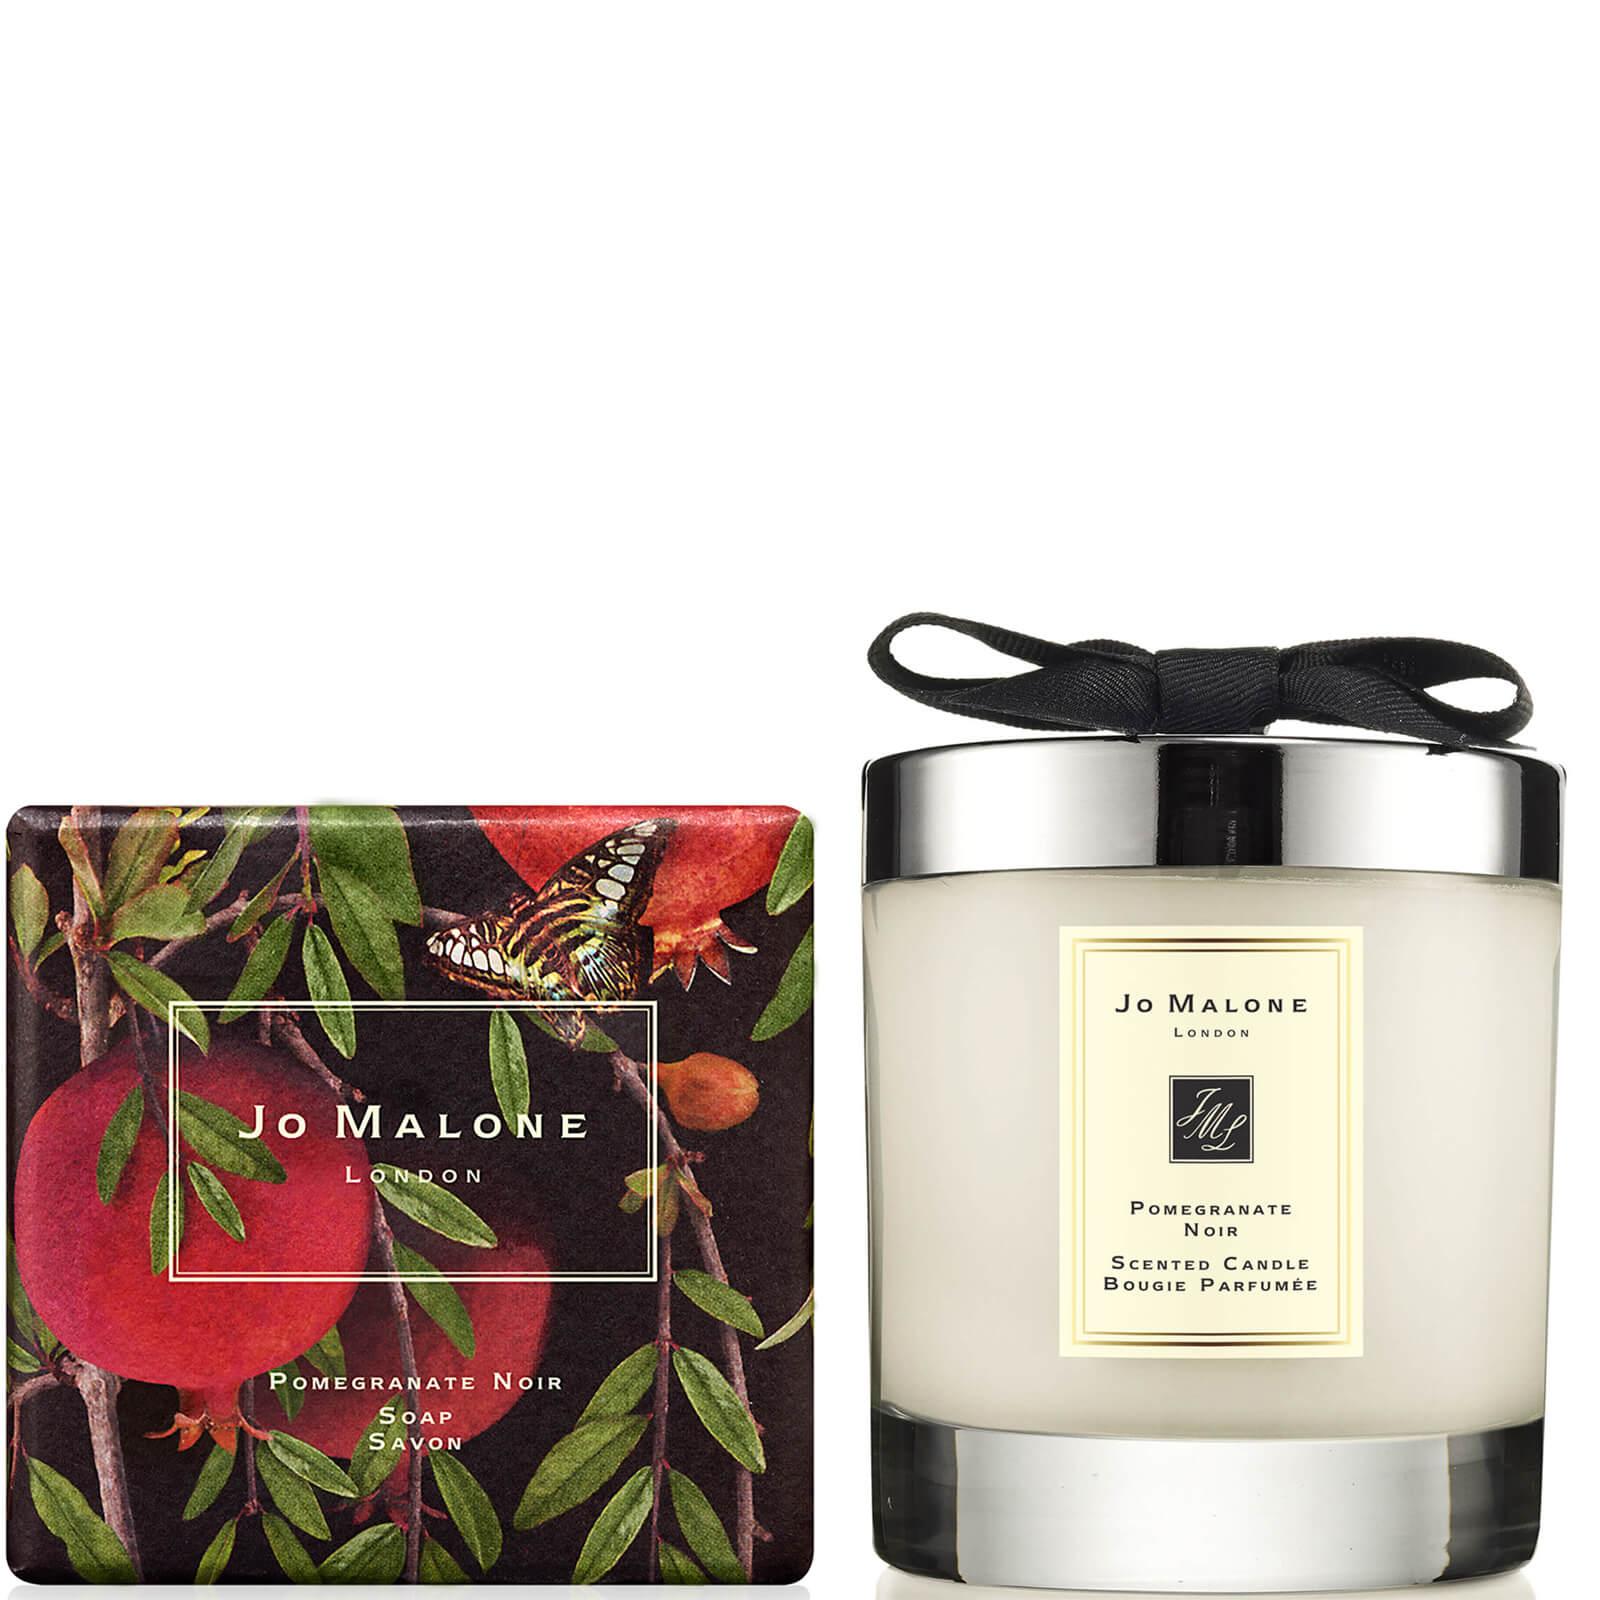 Jo Malone London Pomegranate Noir Soap and Candle Bundle